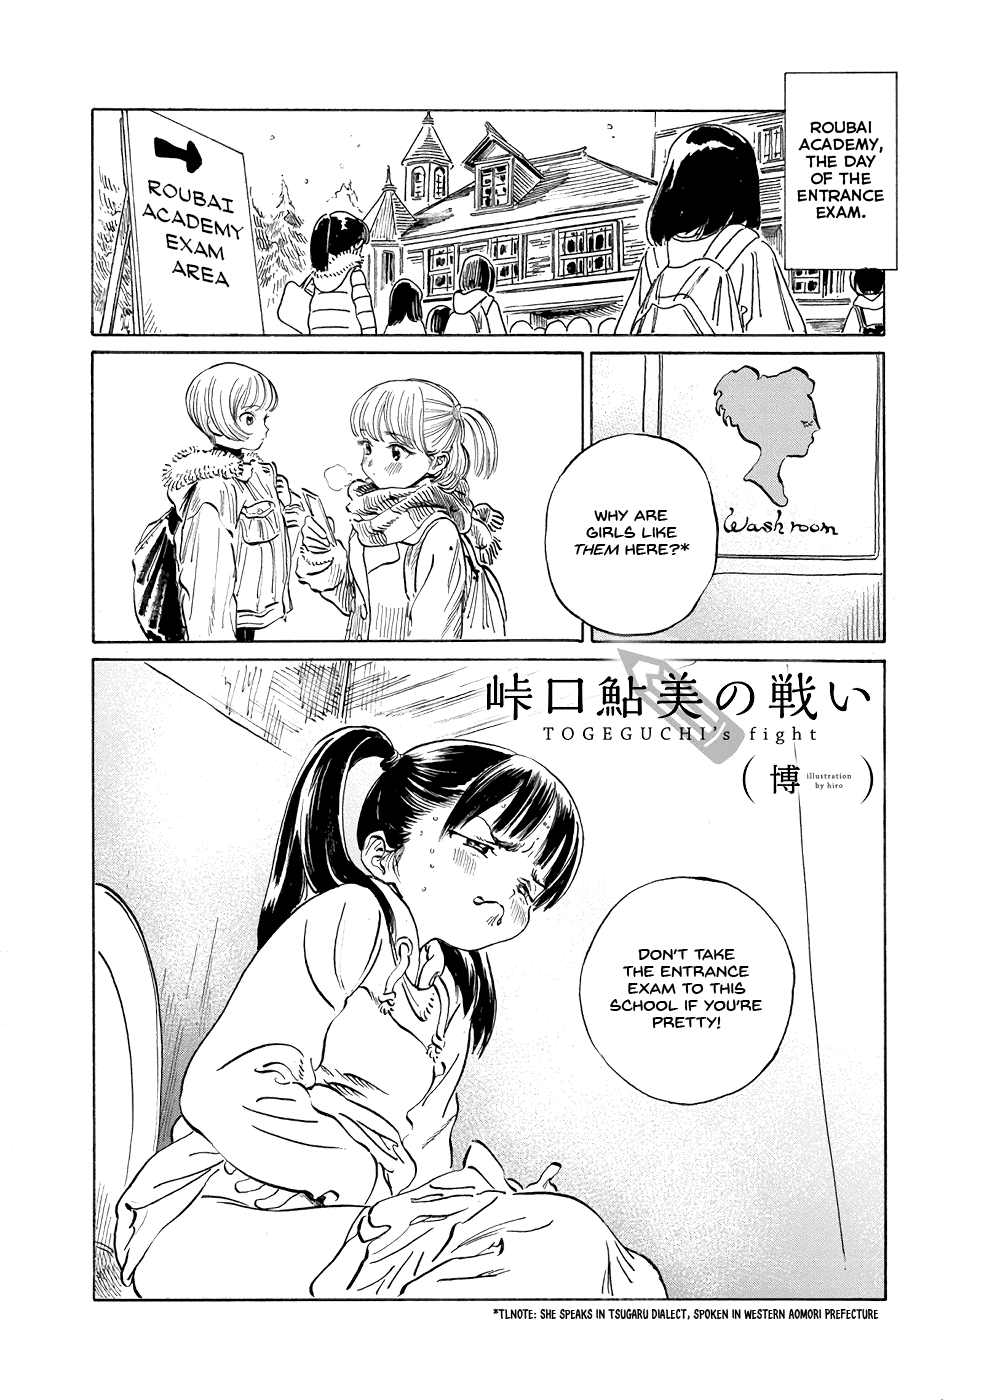 https://manga.mangadogs.com/comics/pic4/36/18532/2495775/a2a394d317ae9d89985646fa98565f36.jpg Page 1